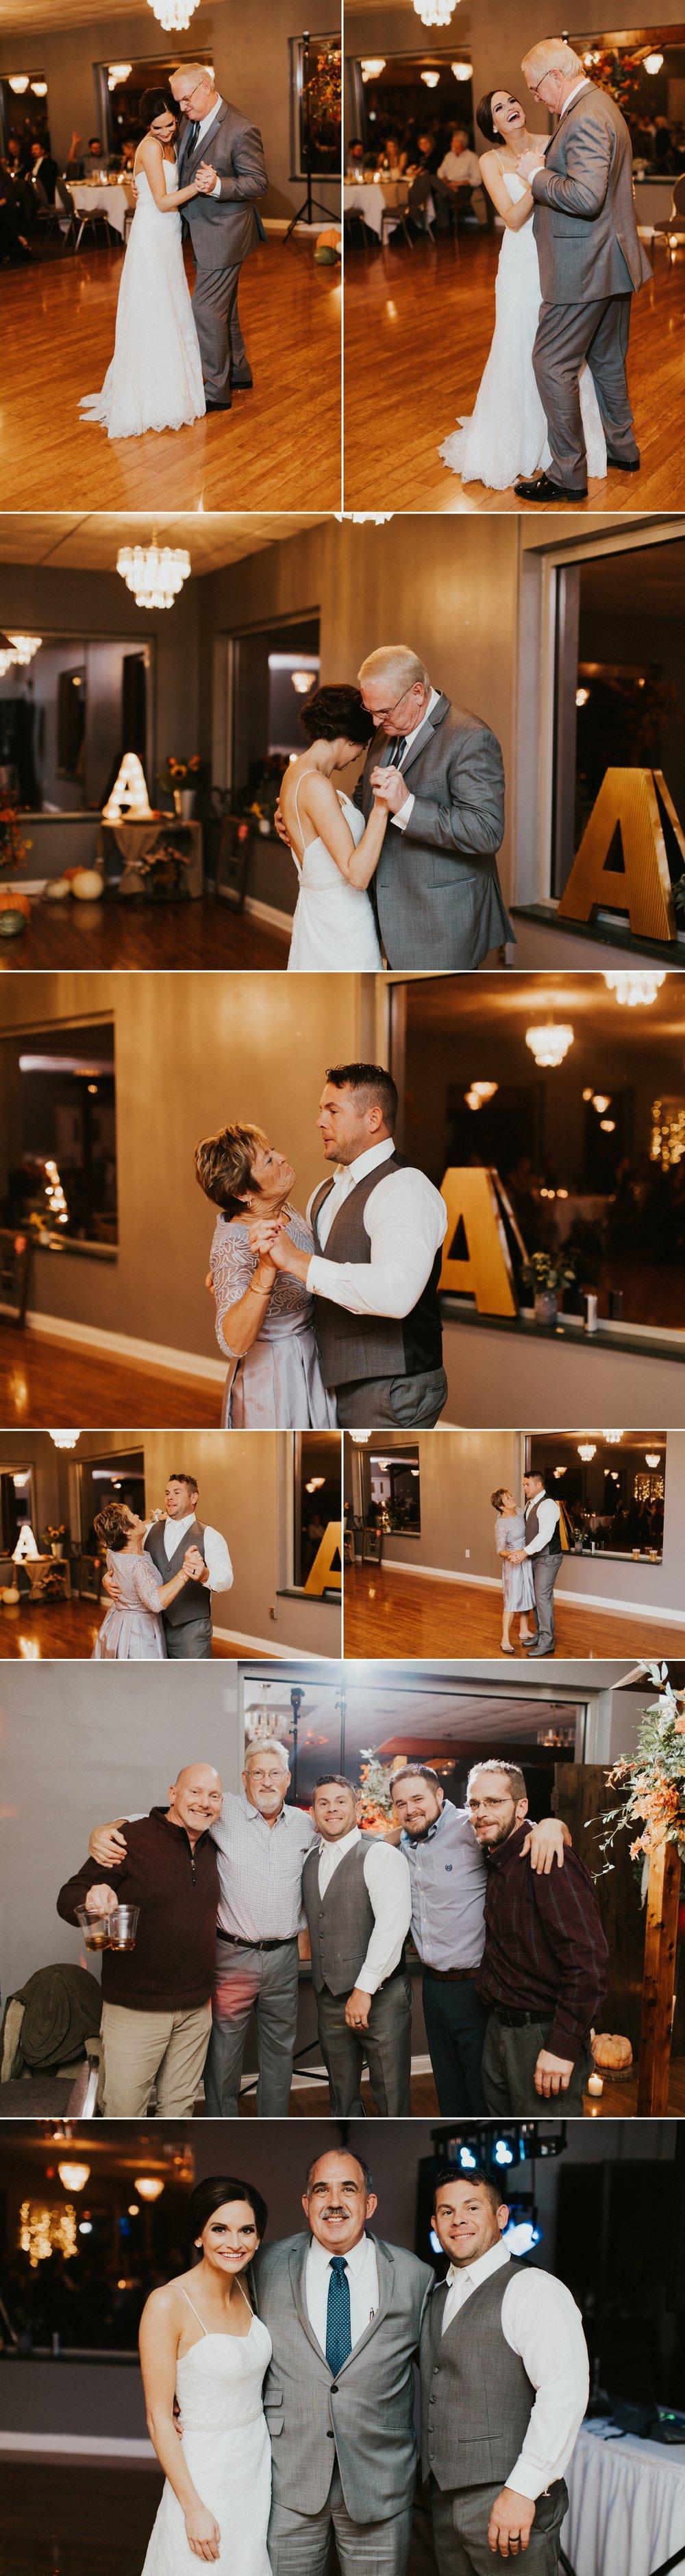 The Ault Wedding 15.jpg